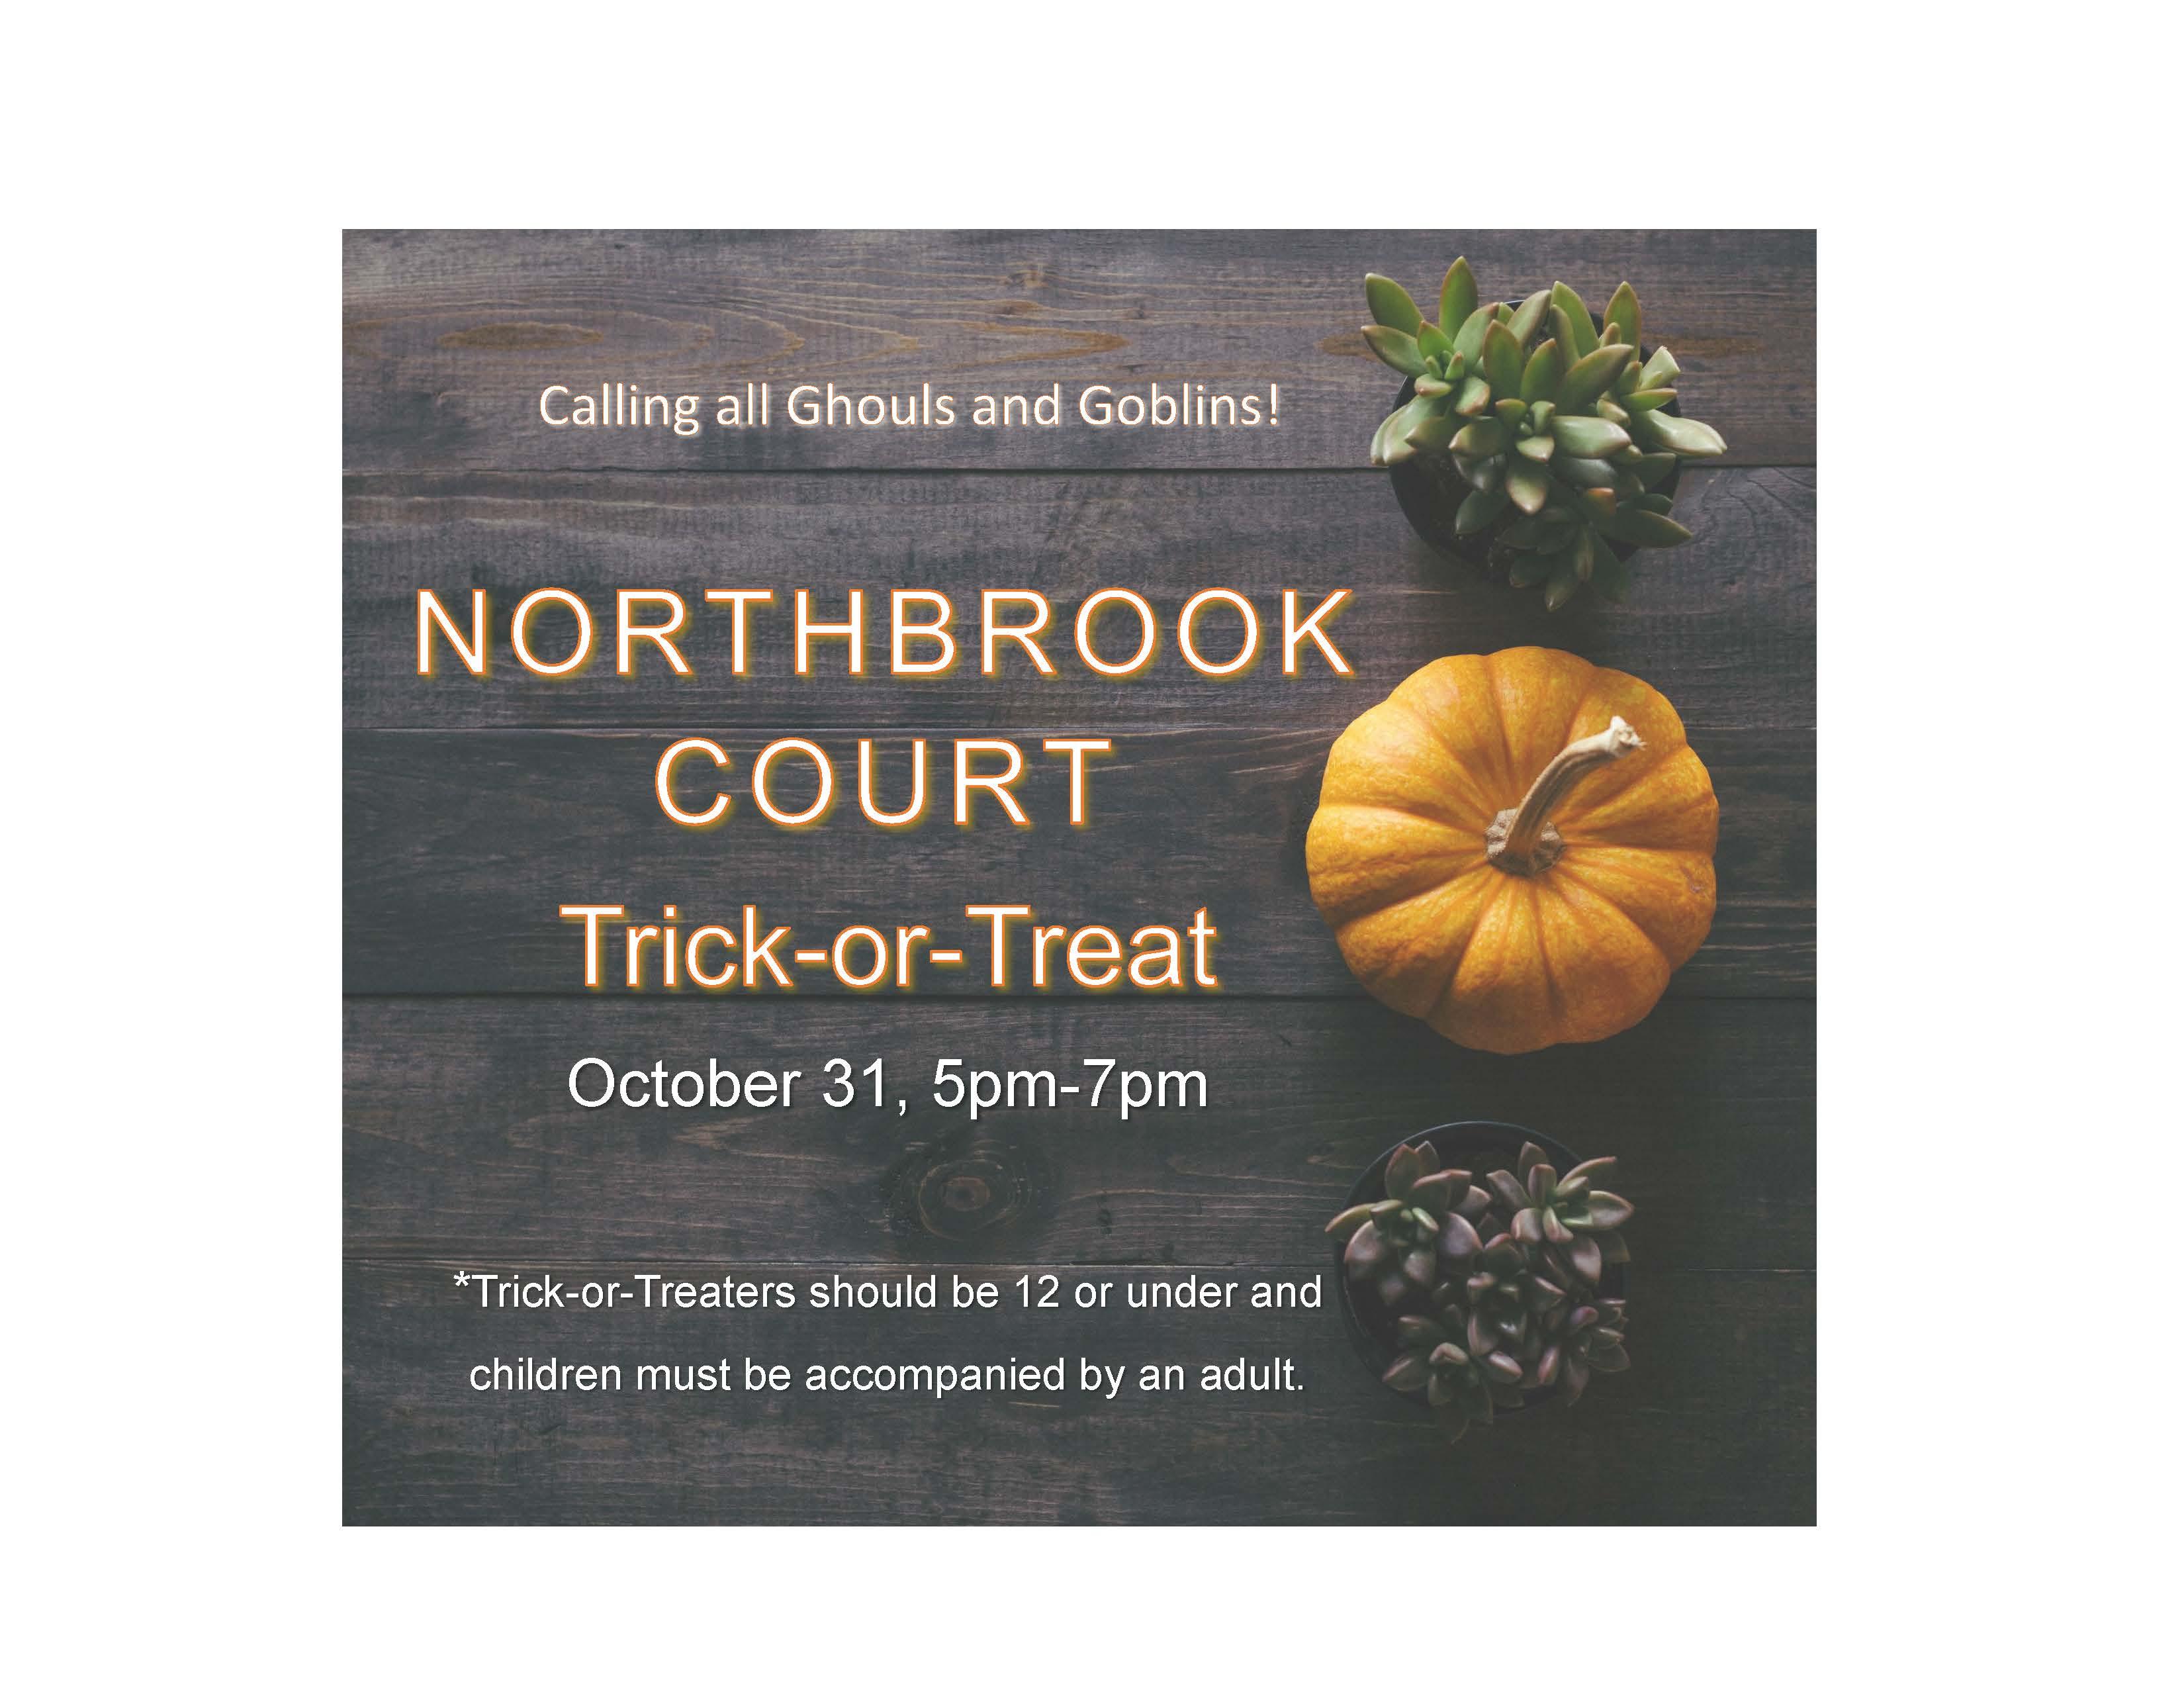 Northbrook Court